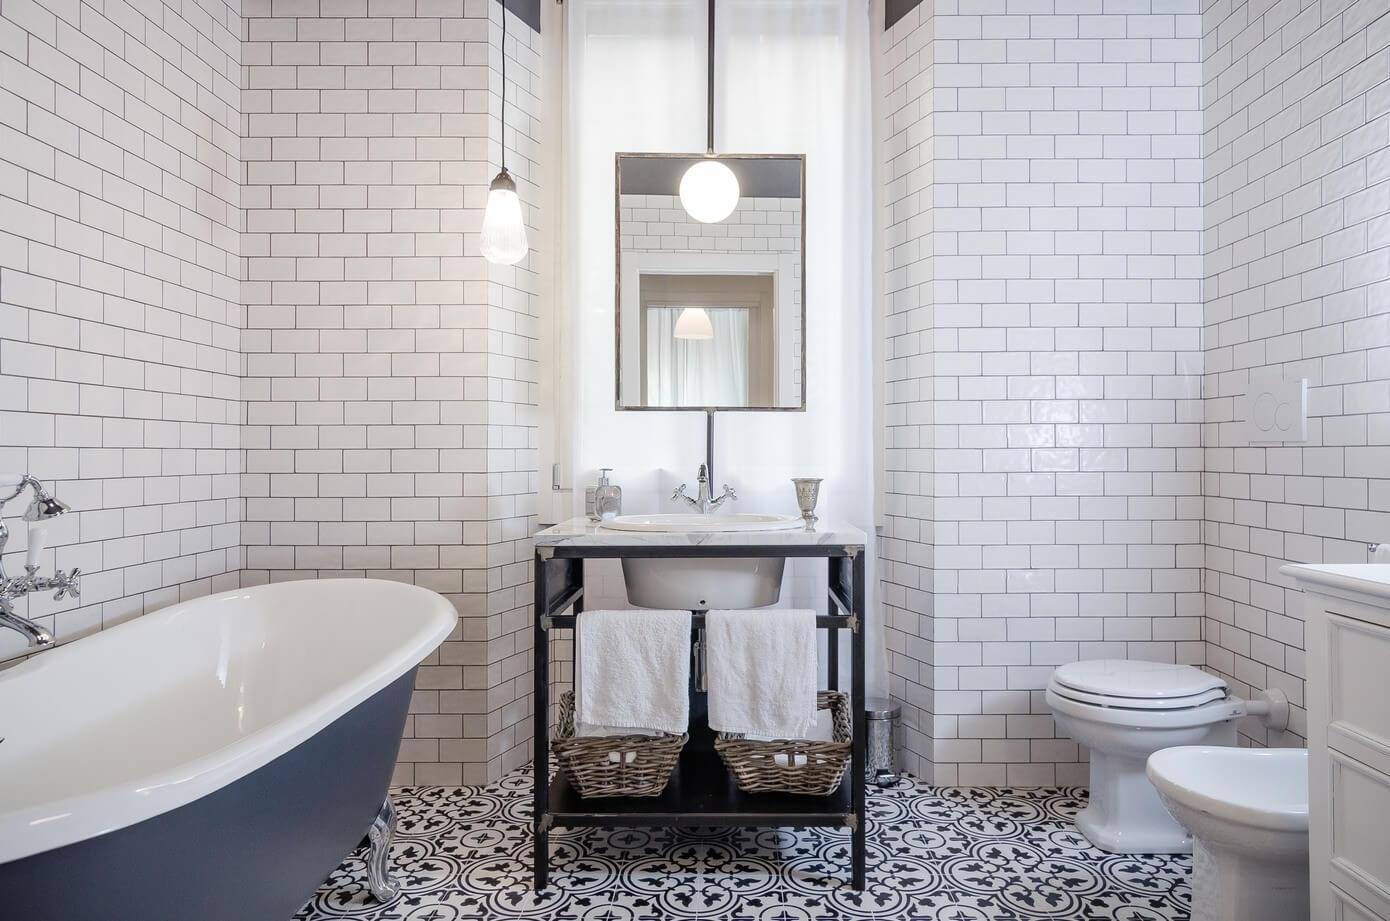 Светлая ванная комната в стиле лофт